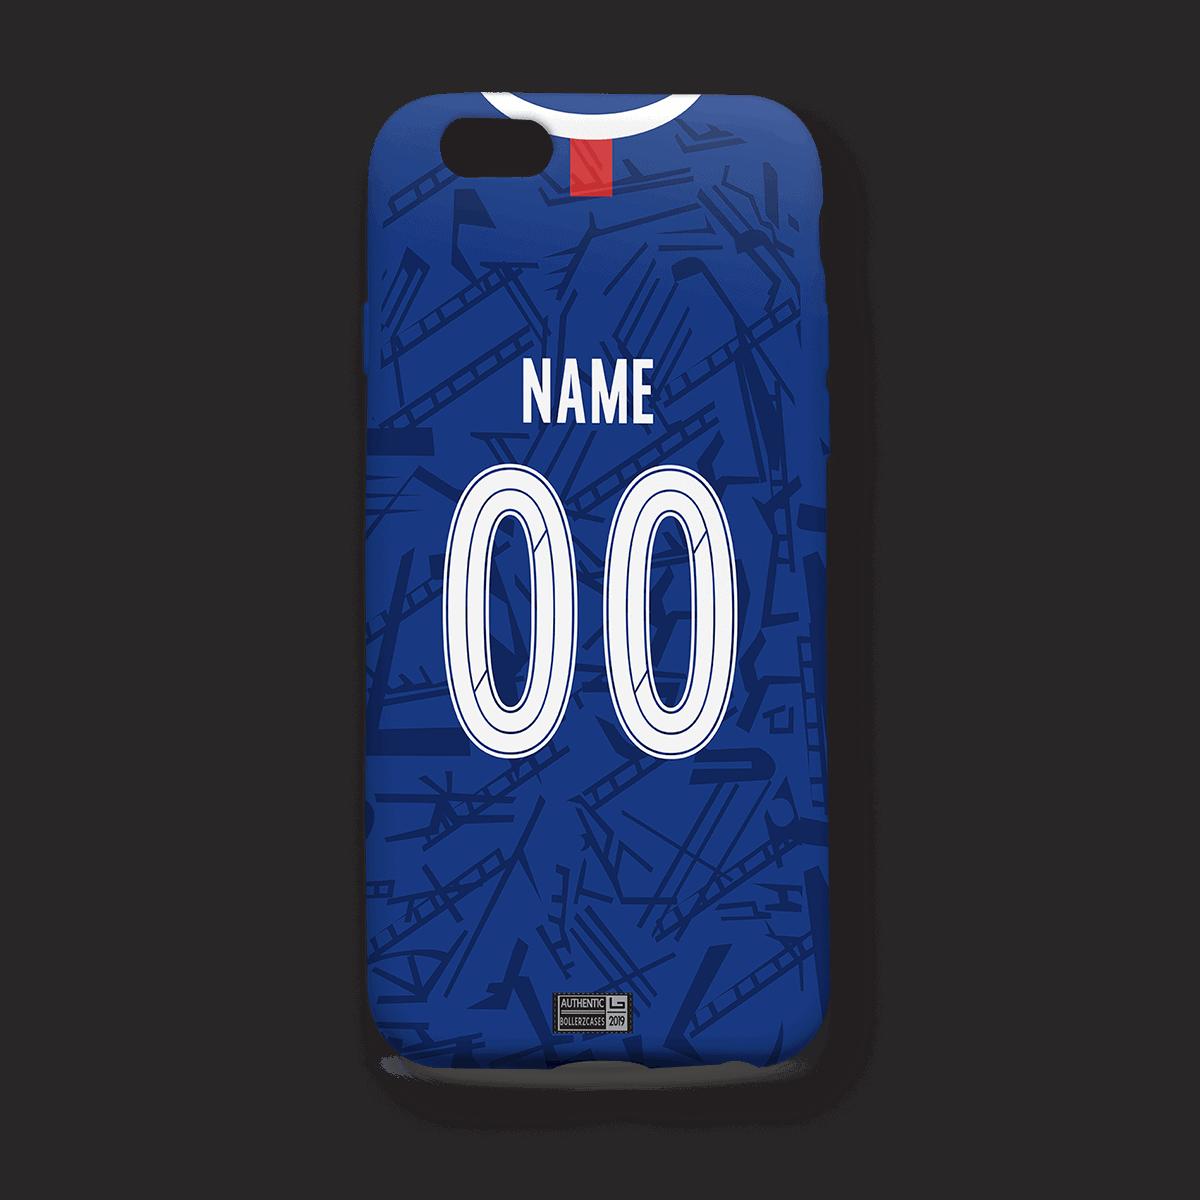 Chelsea Phone case Home Kit 19/20